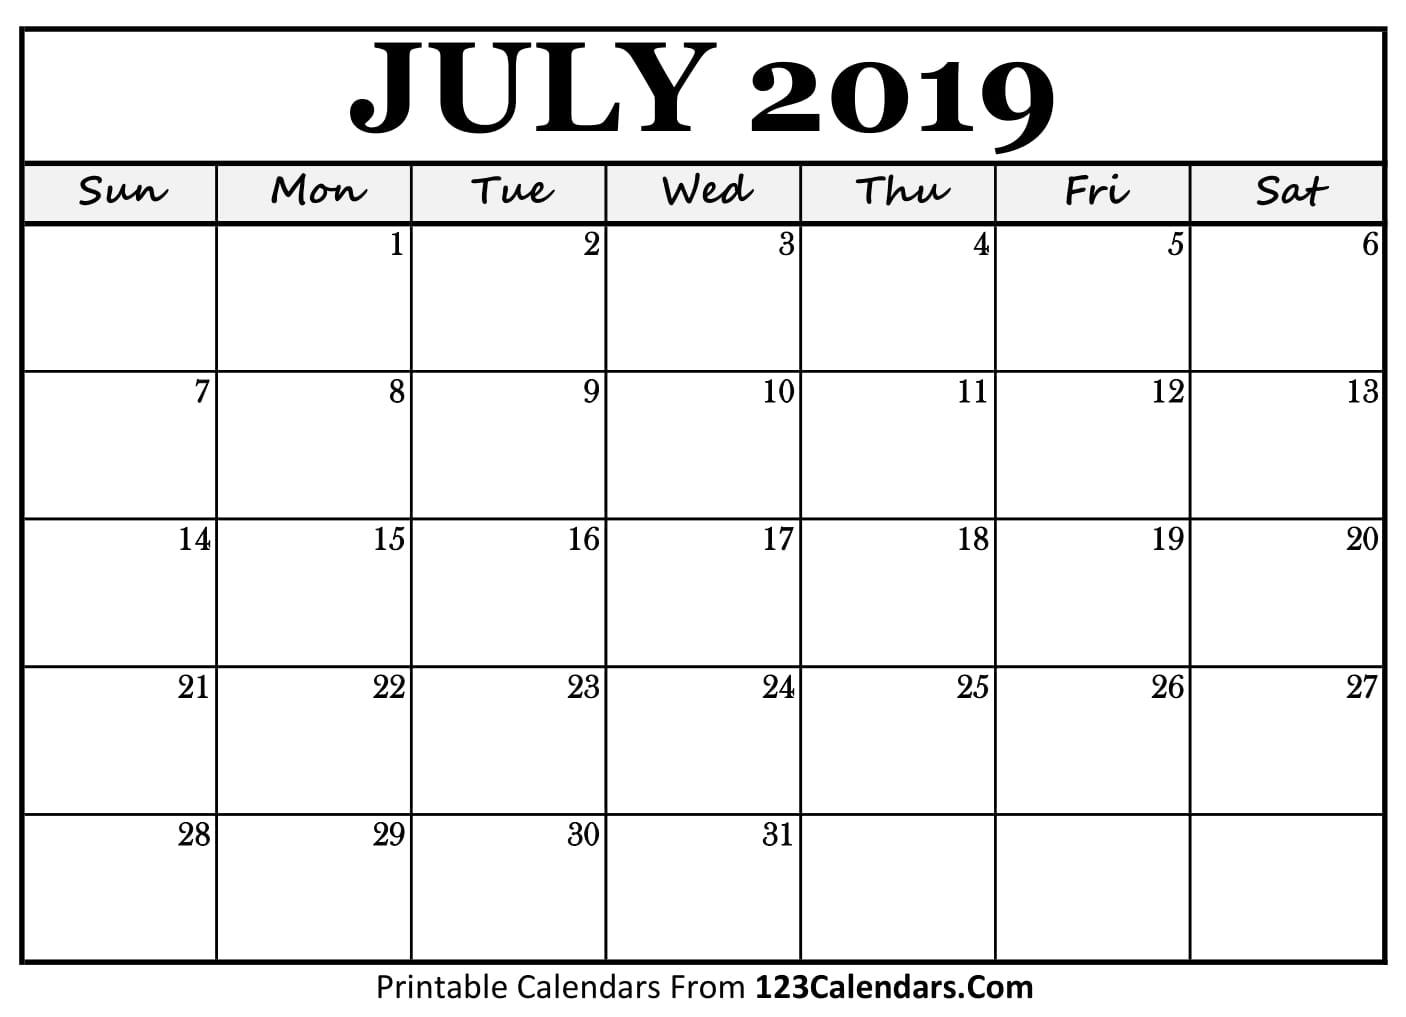 July 2019 Calendar Blank Easily Printable 123calendars